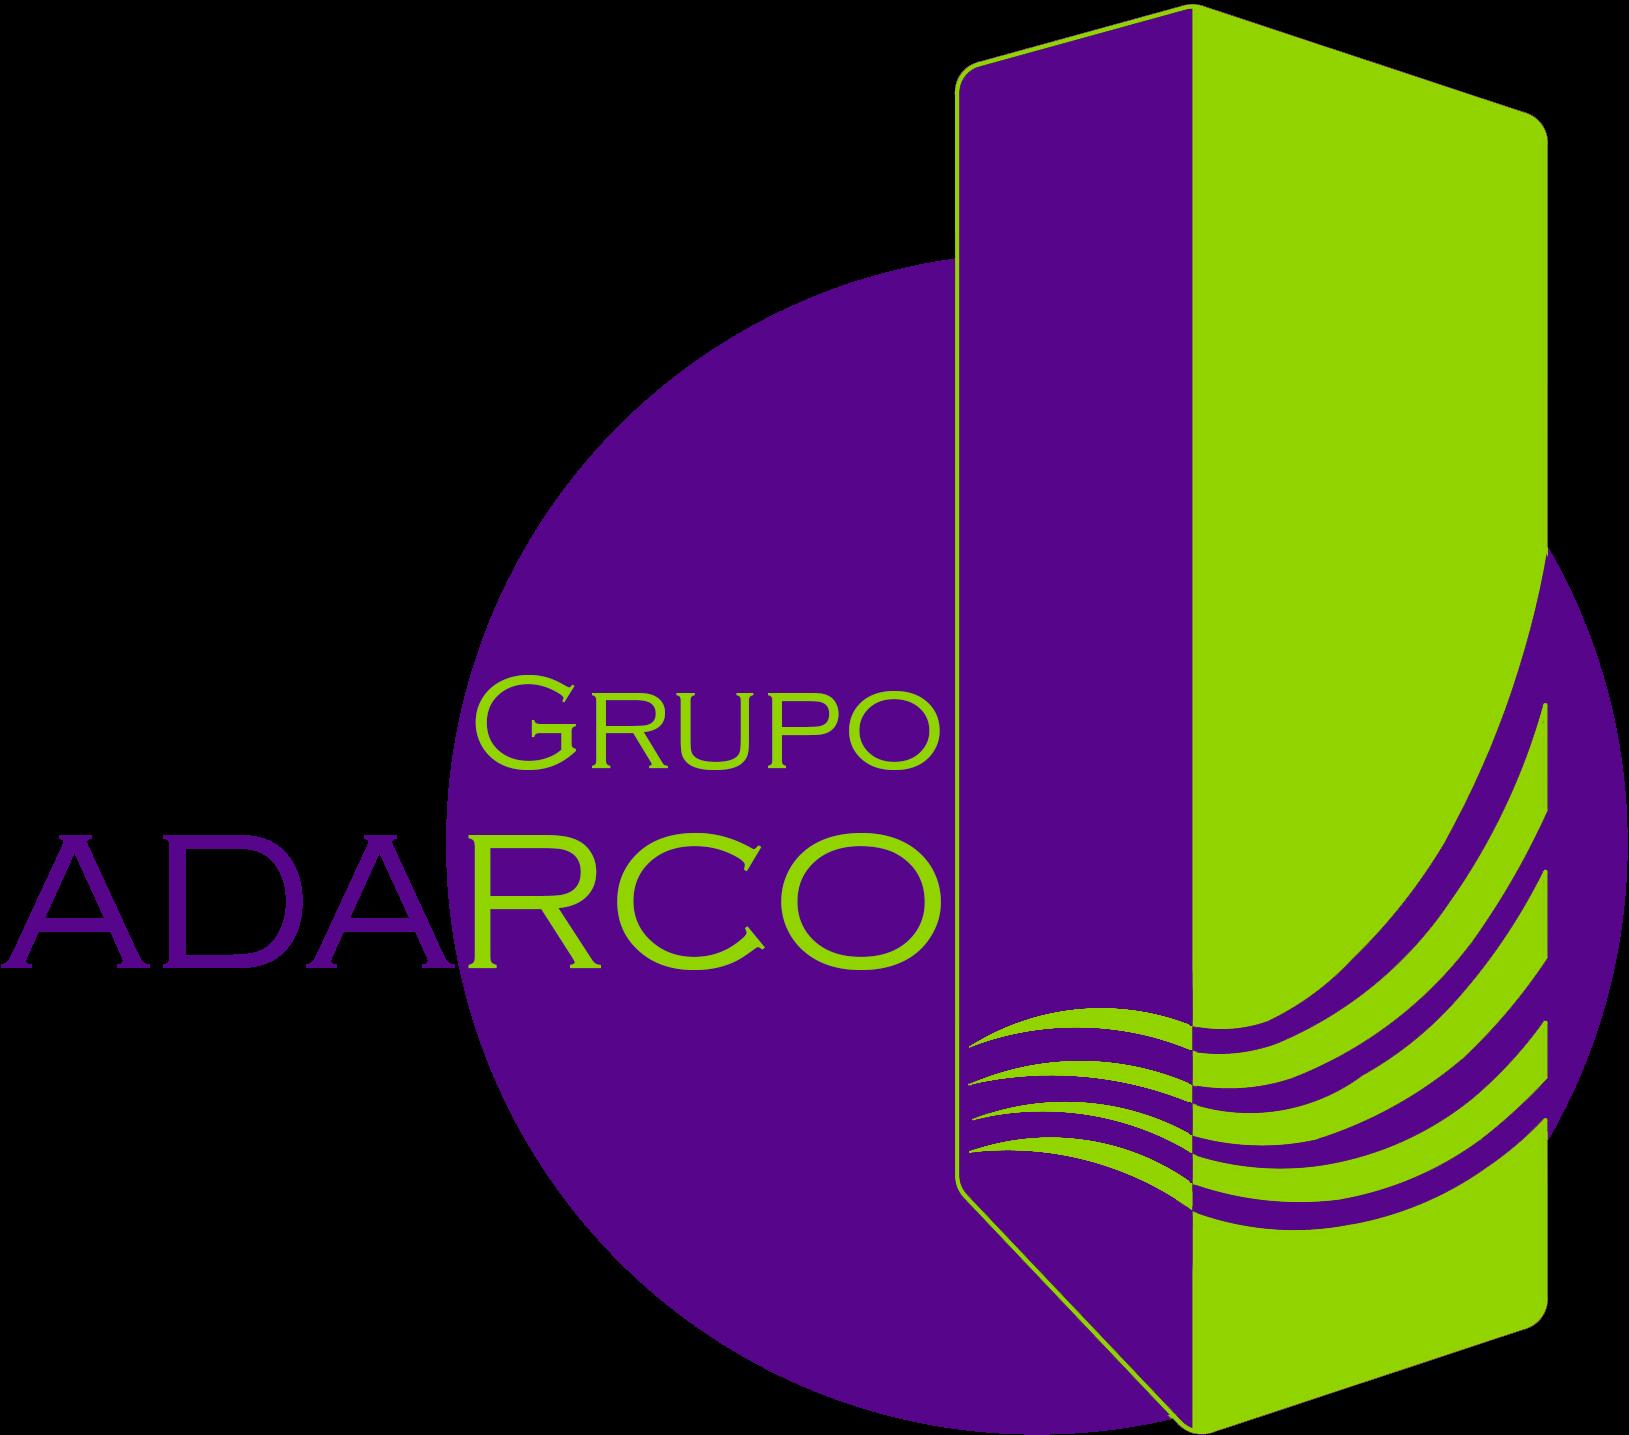 Grupo Adarco